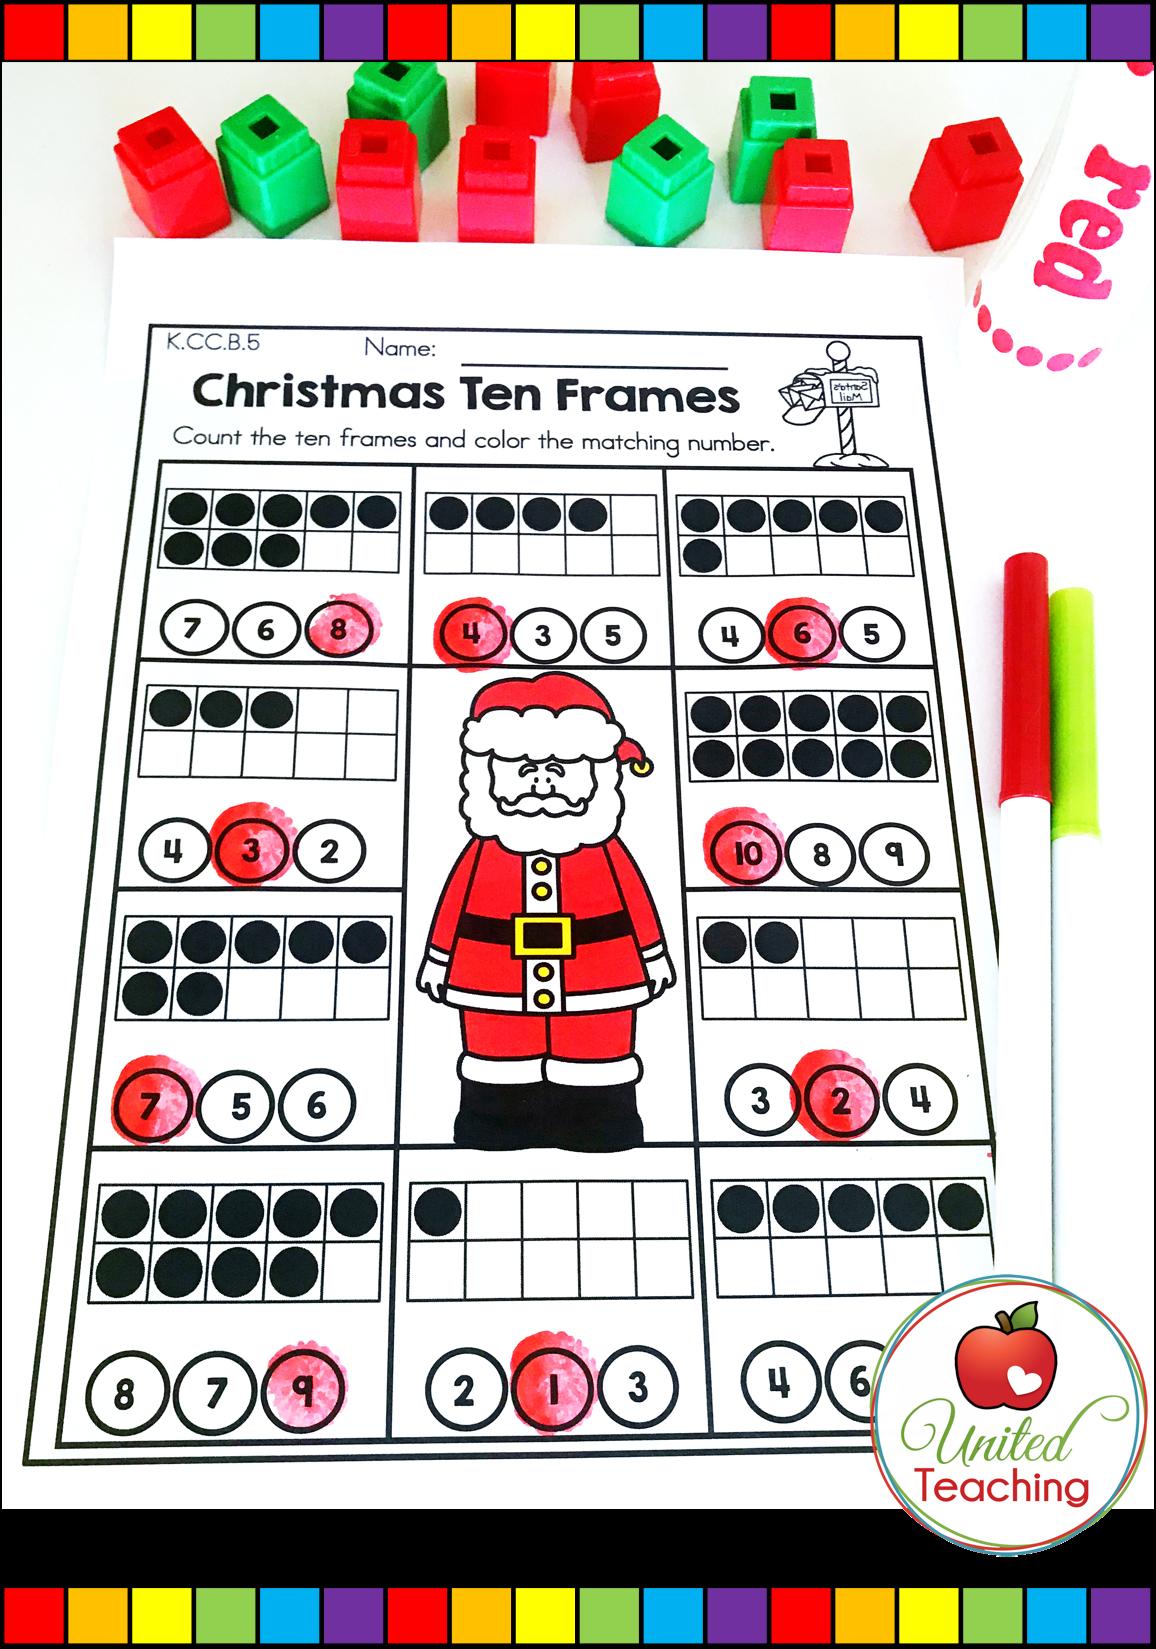 Christmas Math And Literacy Kindergarten No Prep Activities Christmas Math Activities Christmas Math Activities Kindergarten Kindergarten Math Activities [ 1649 x 1156 Pixel ]